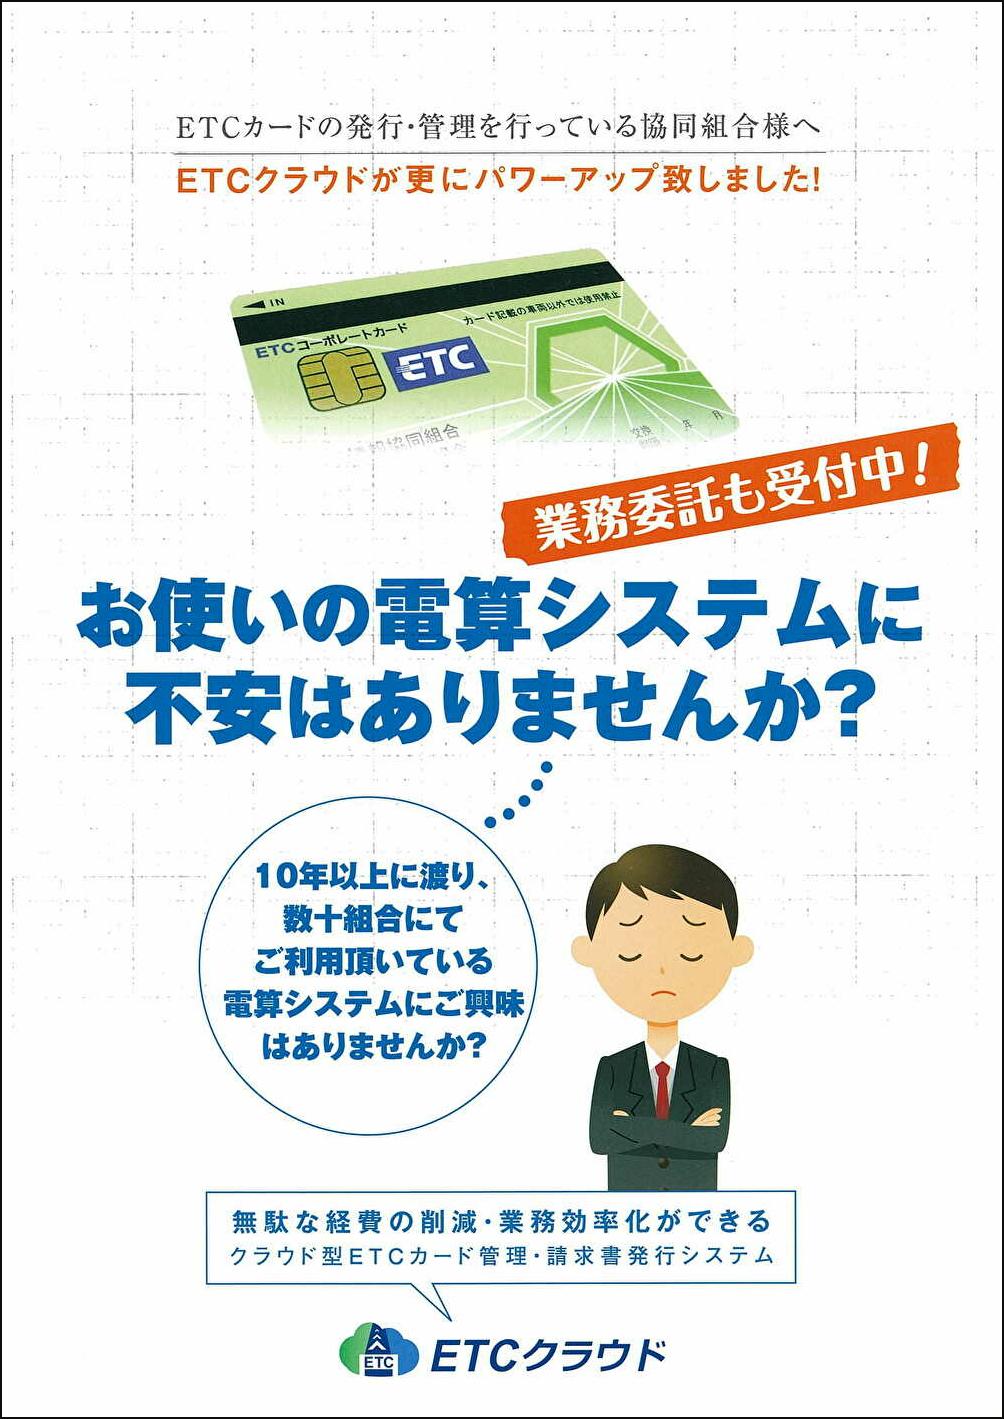 ETCカードの管理・請求書発行なら「ETCクラウド」